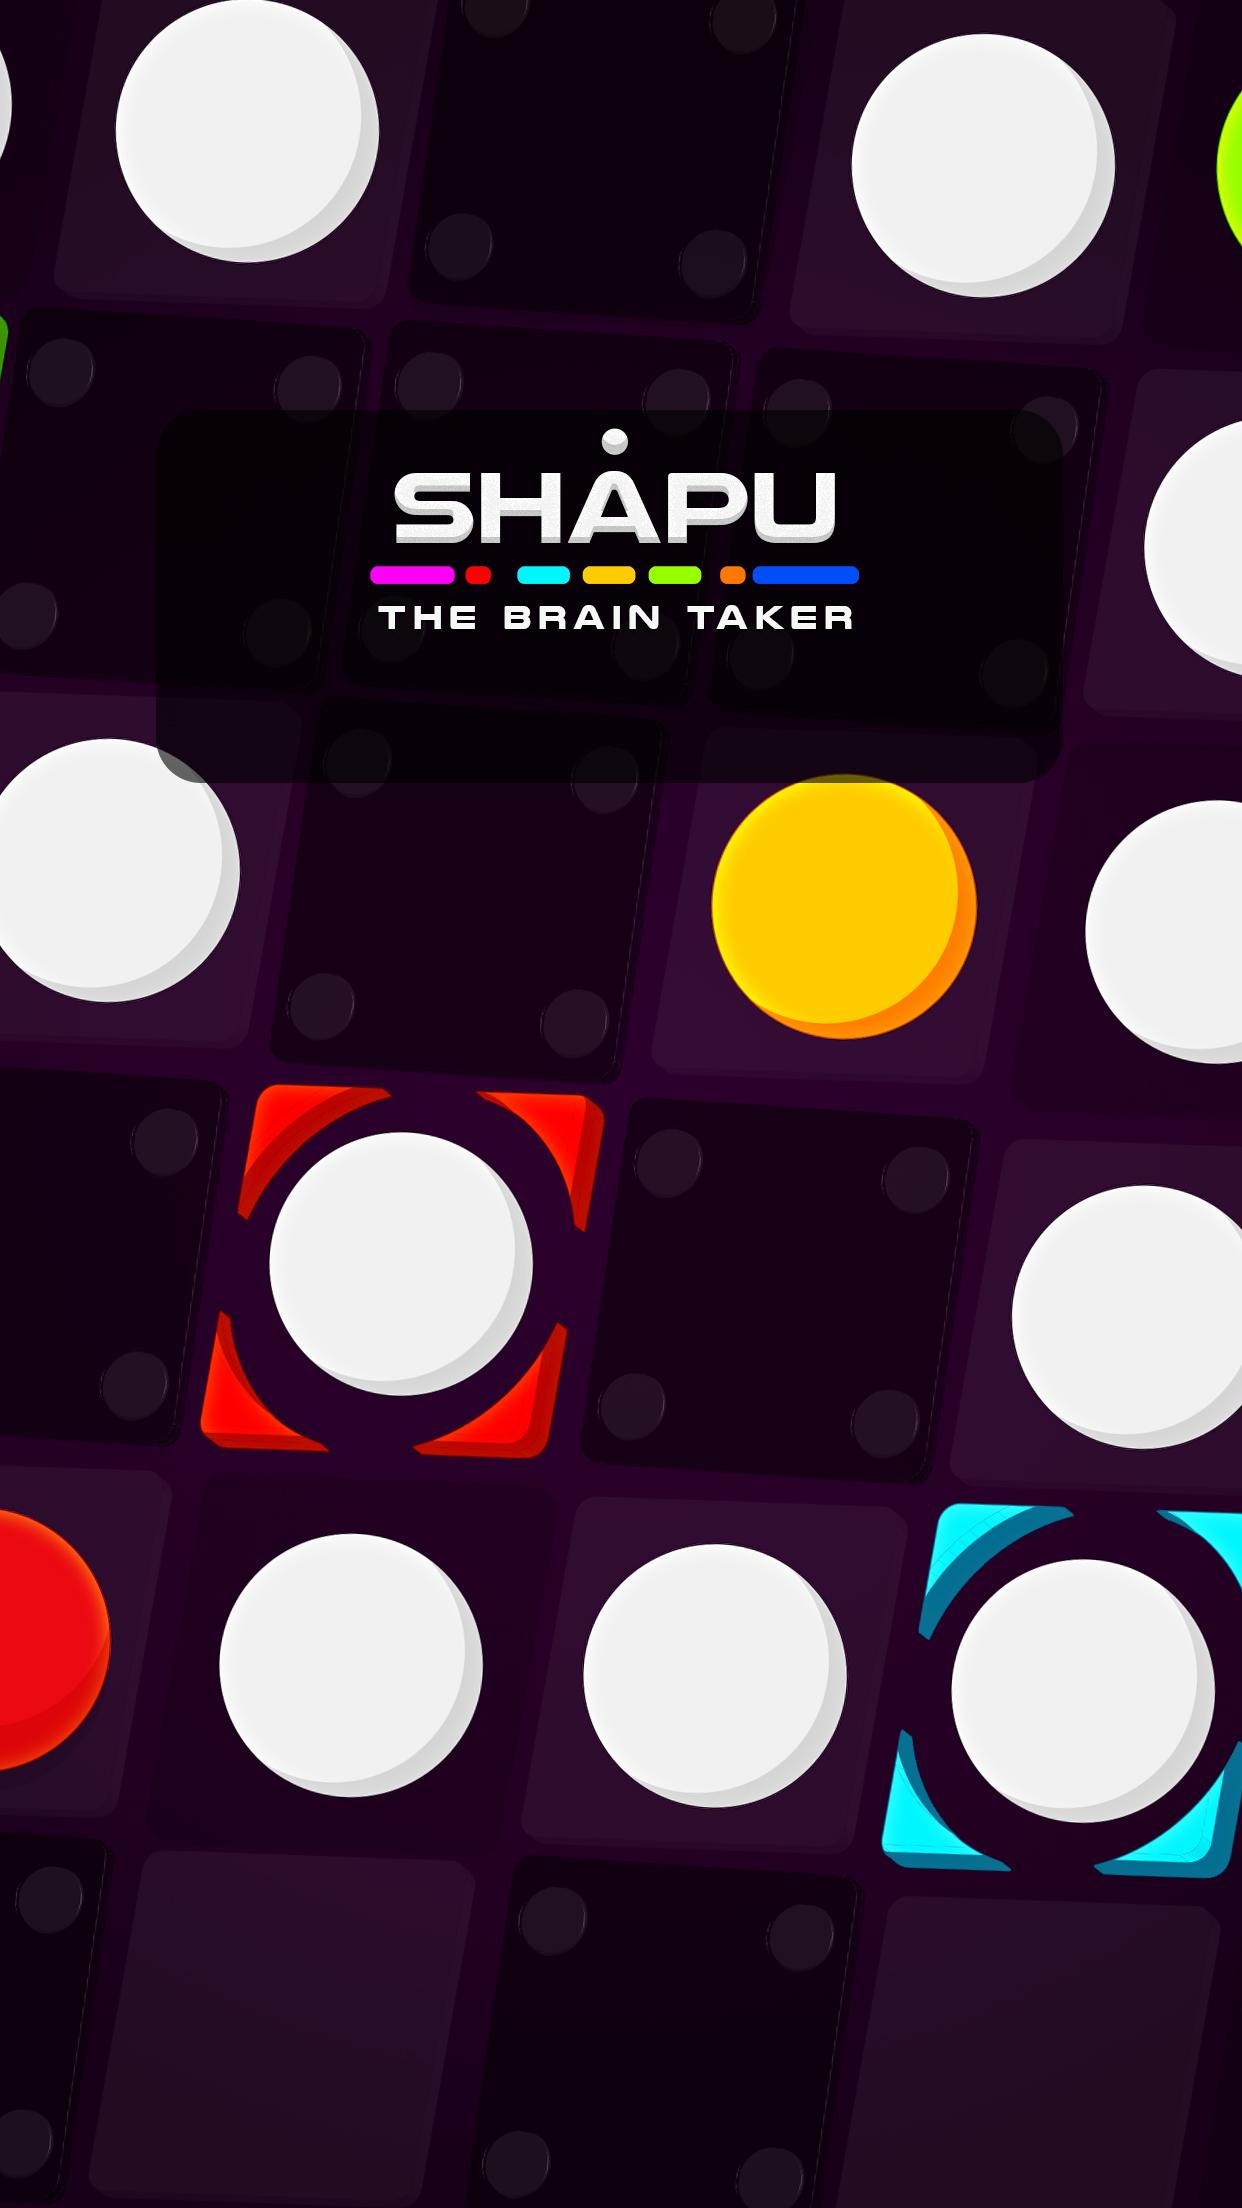 Shapu The brain Taker